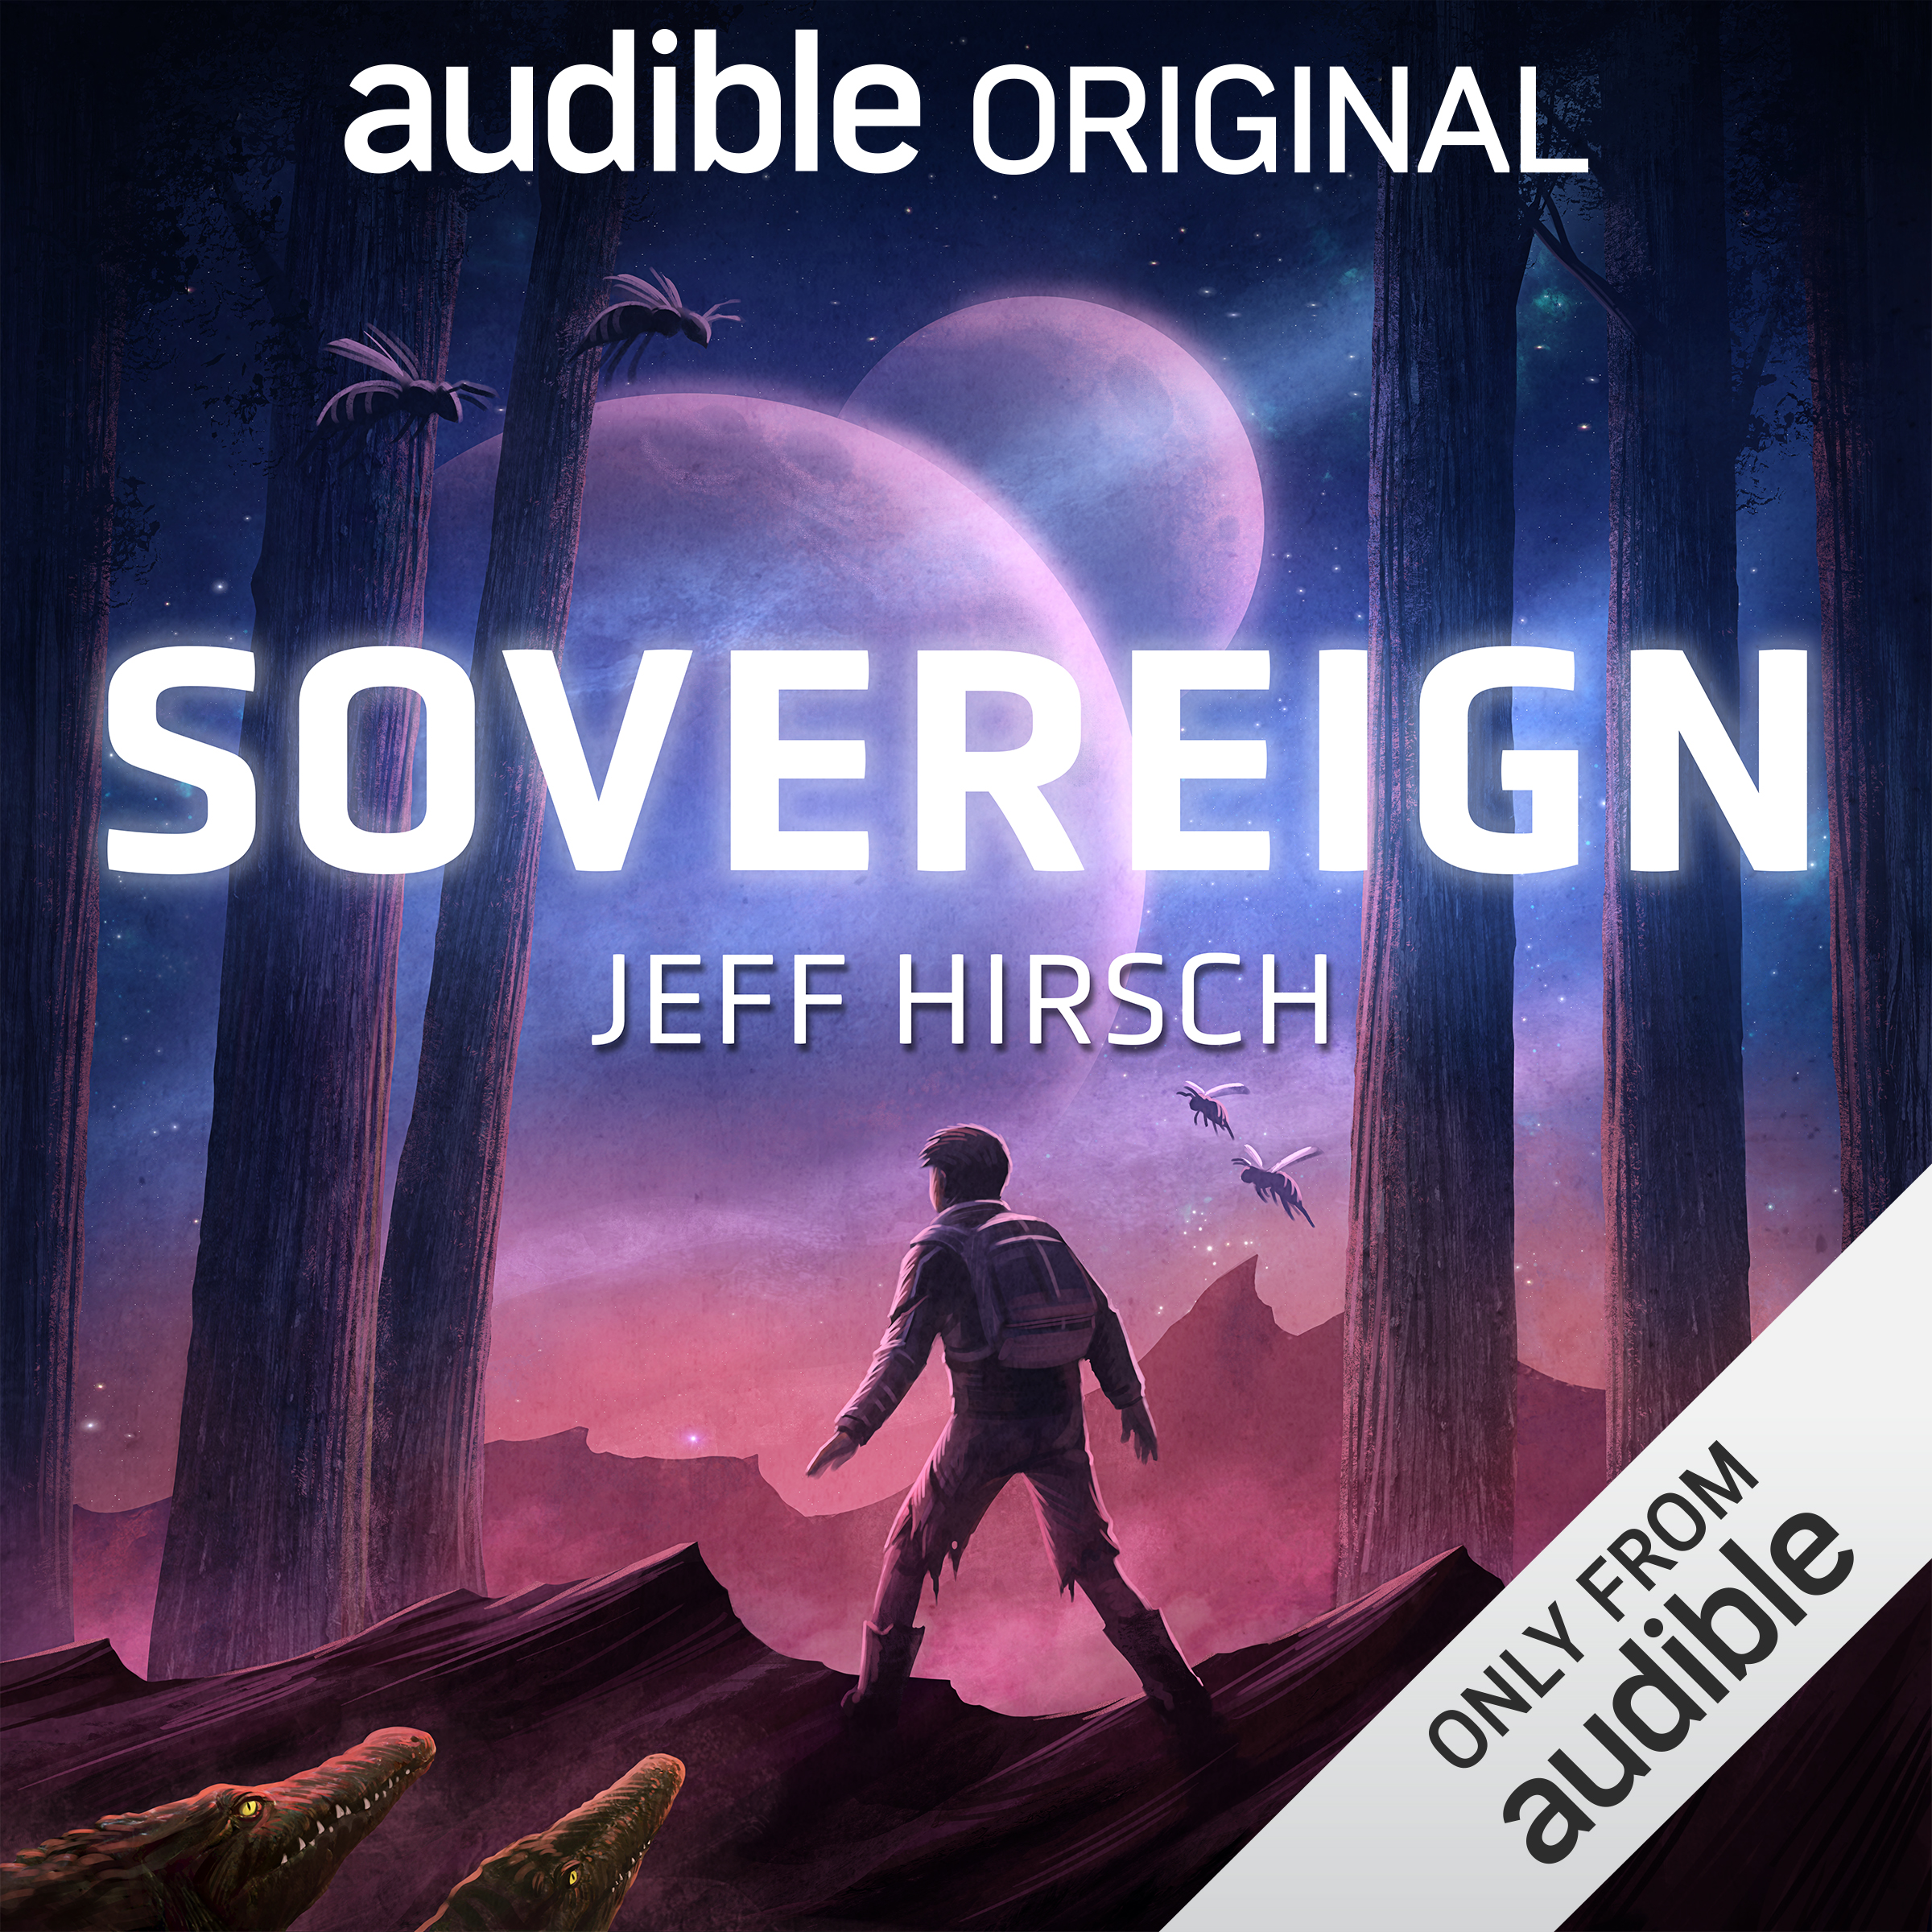 Sovereign_cover_audible.jpg